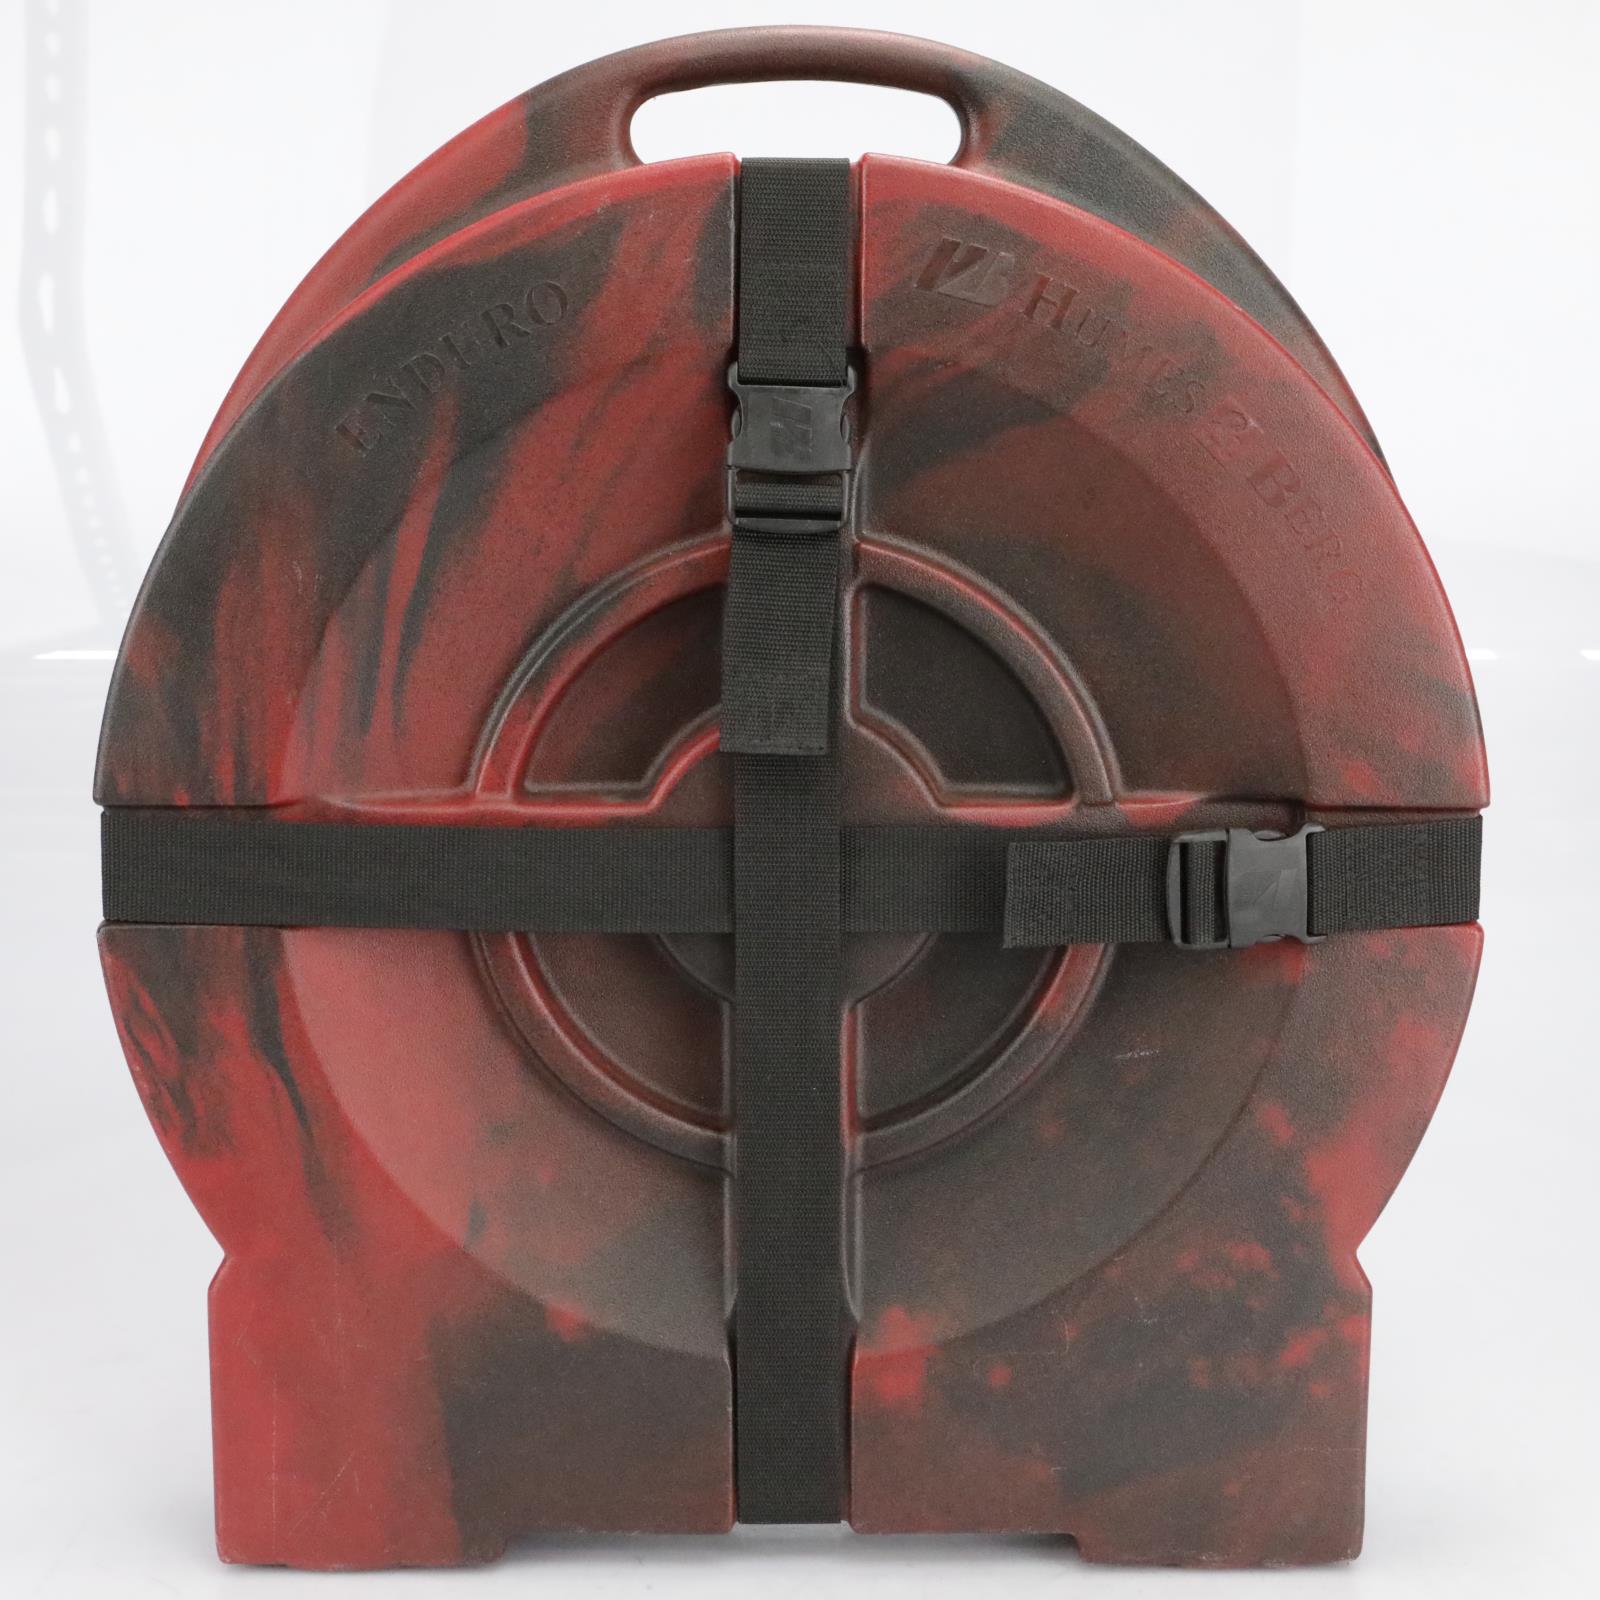 "Humes & Berg Enduro Tilt-n-Pull 24"" Cymbal Hard Case Active Burn Red #41034"